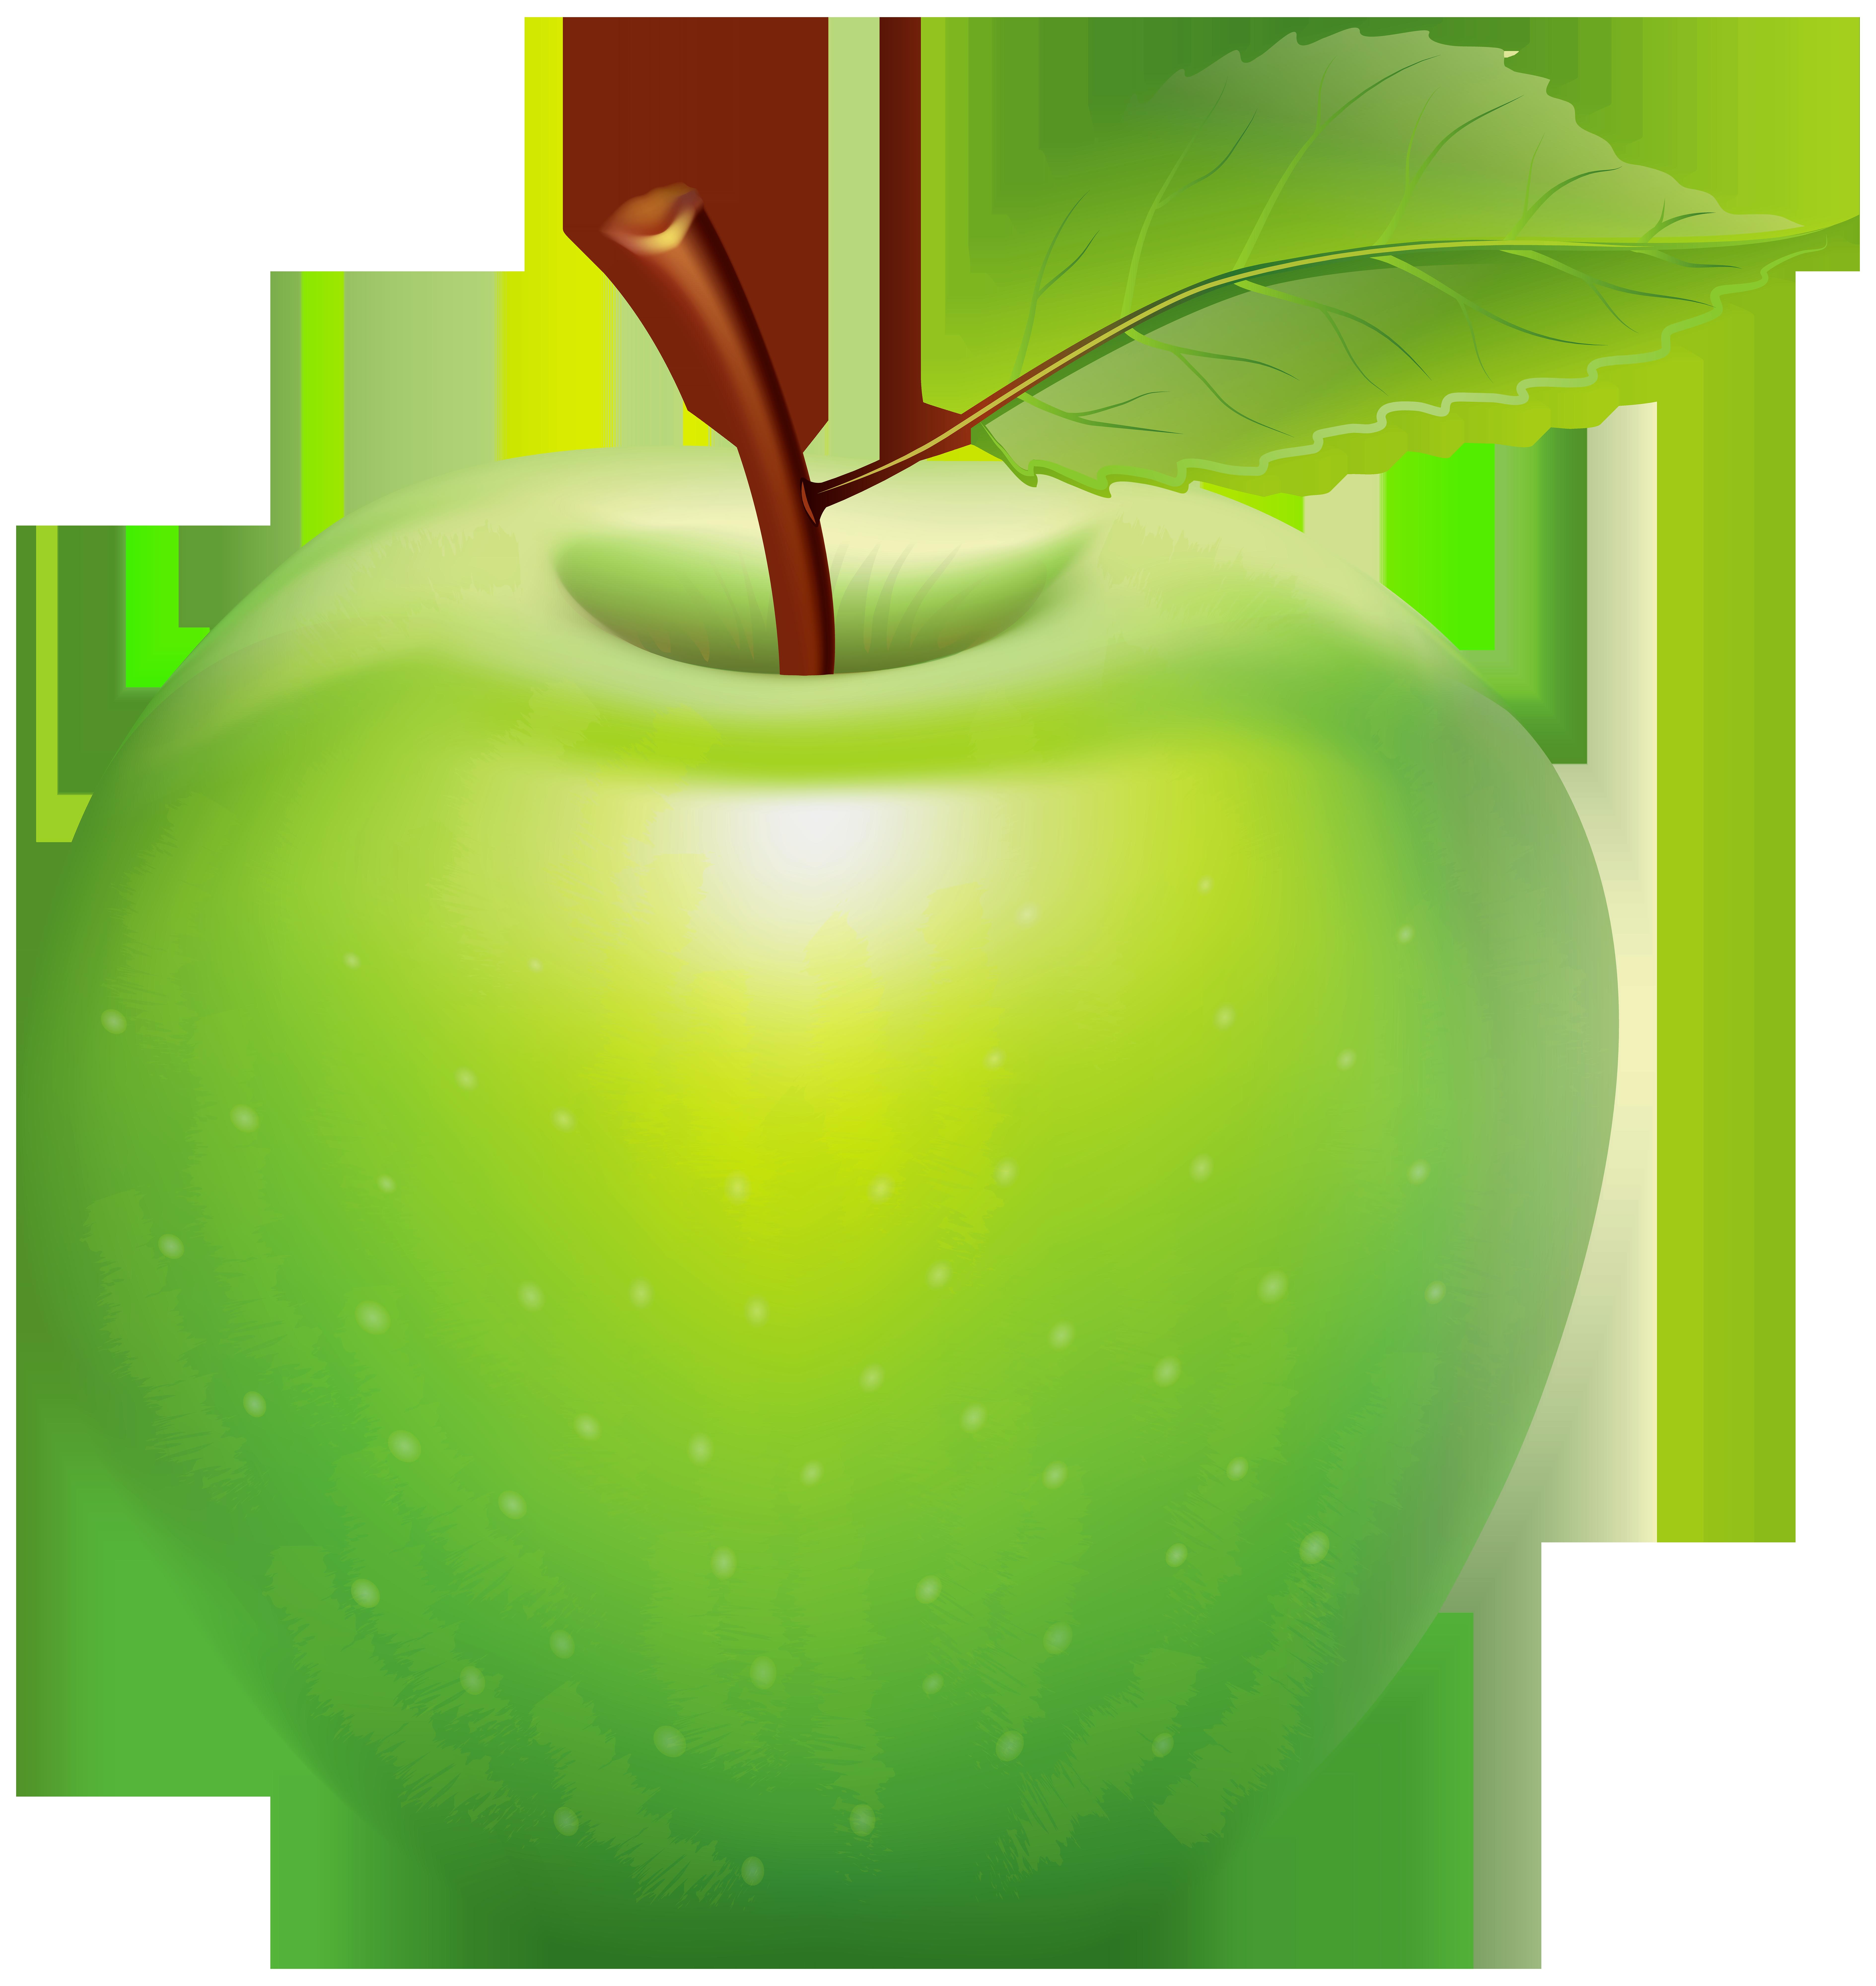 Green Apple PNG Clip Art Image.